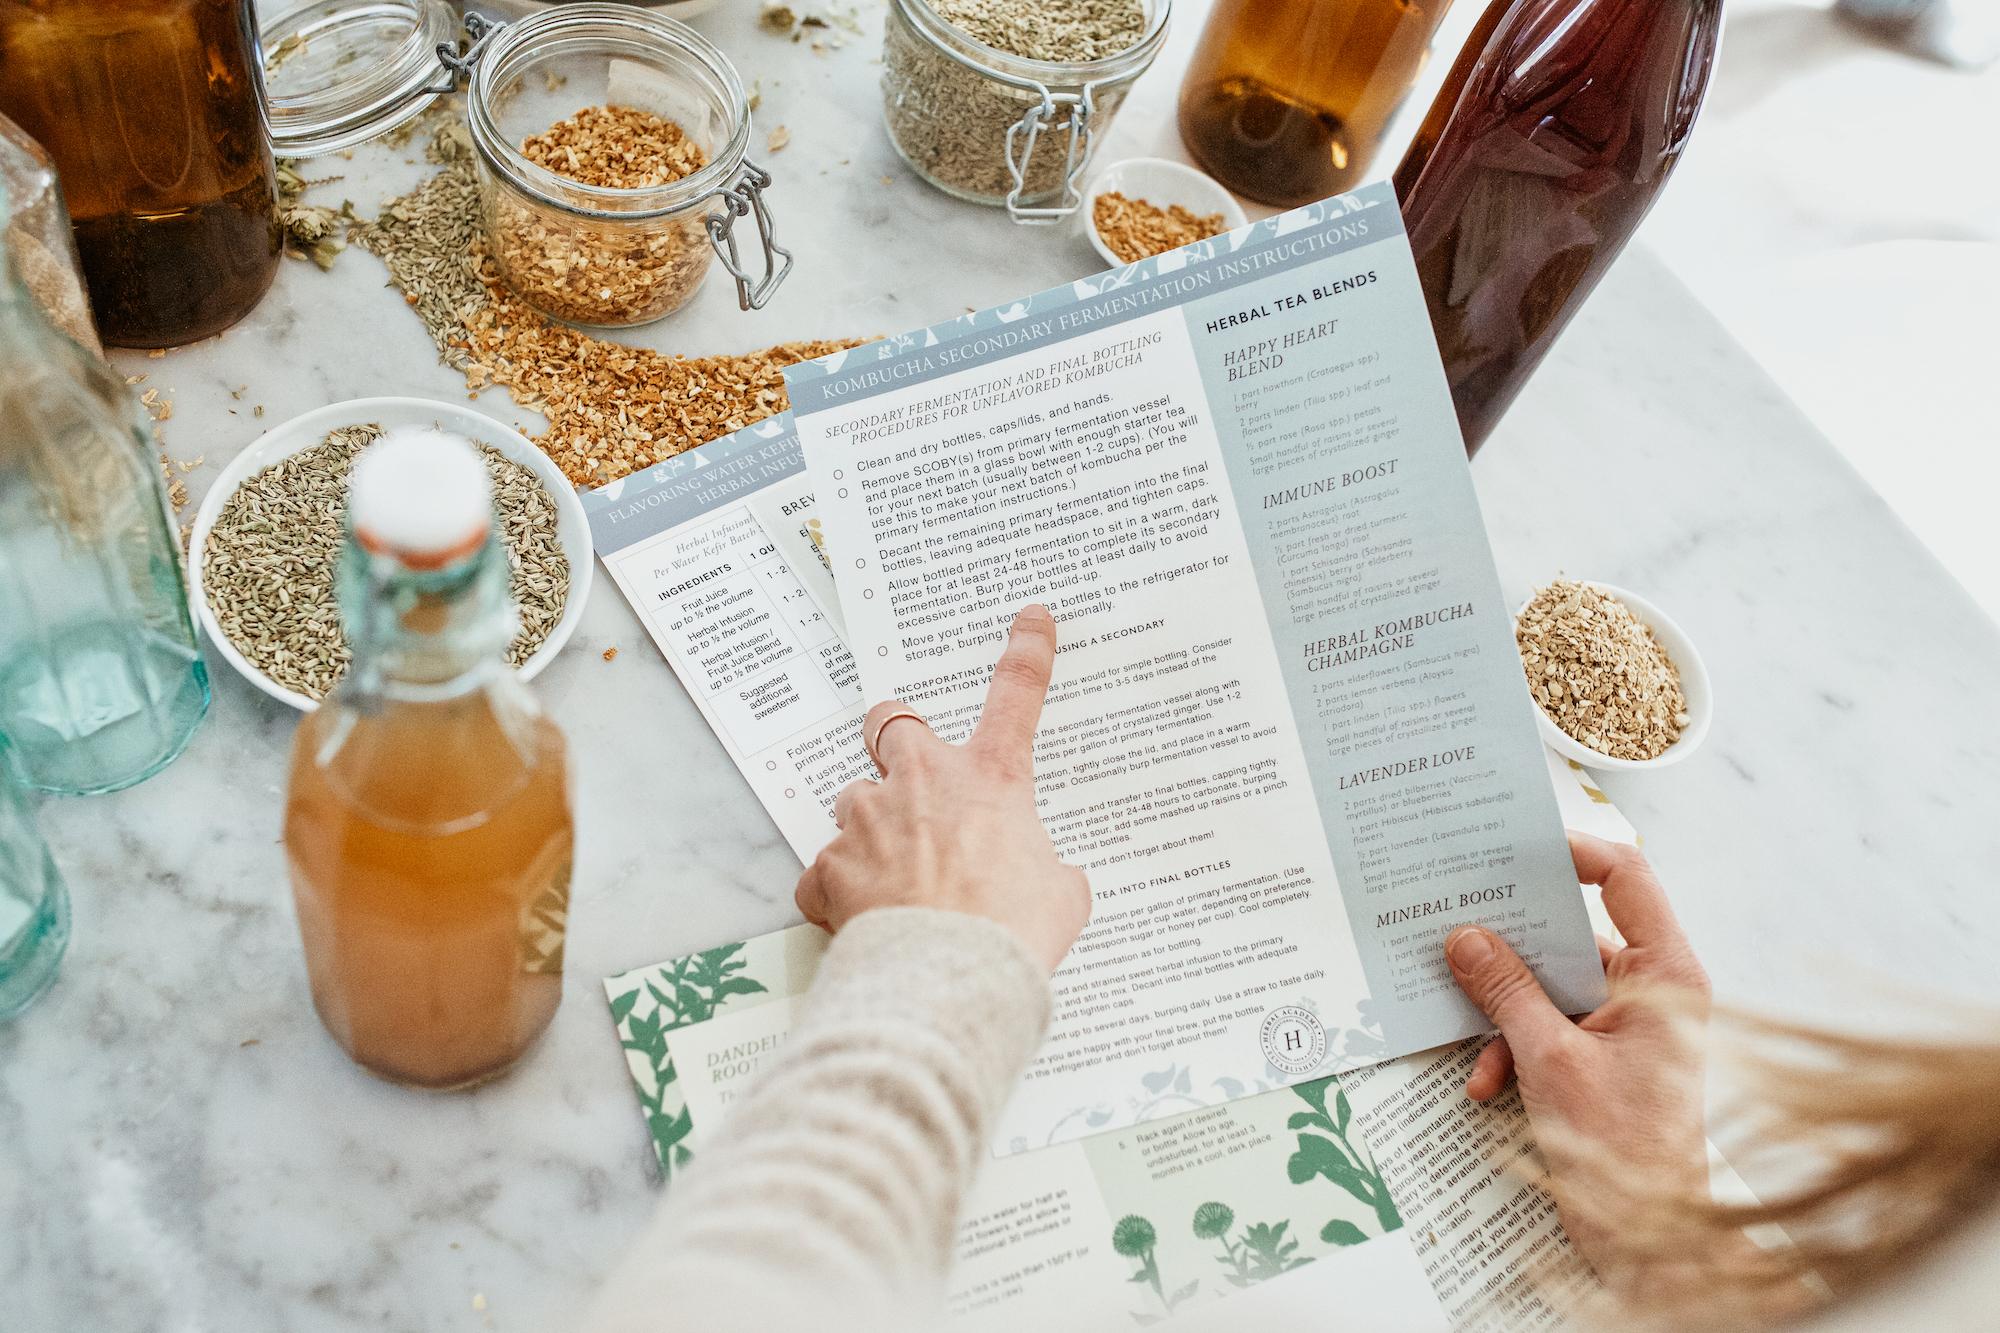 Kombucha charts in the Herbal Fermentation Course